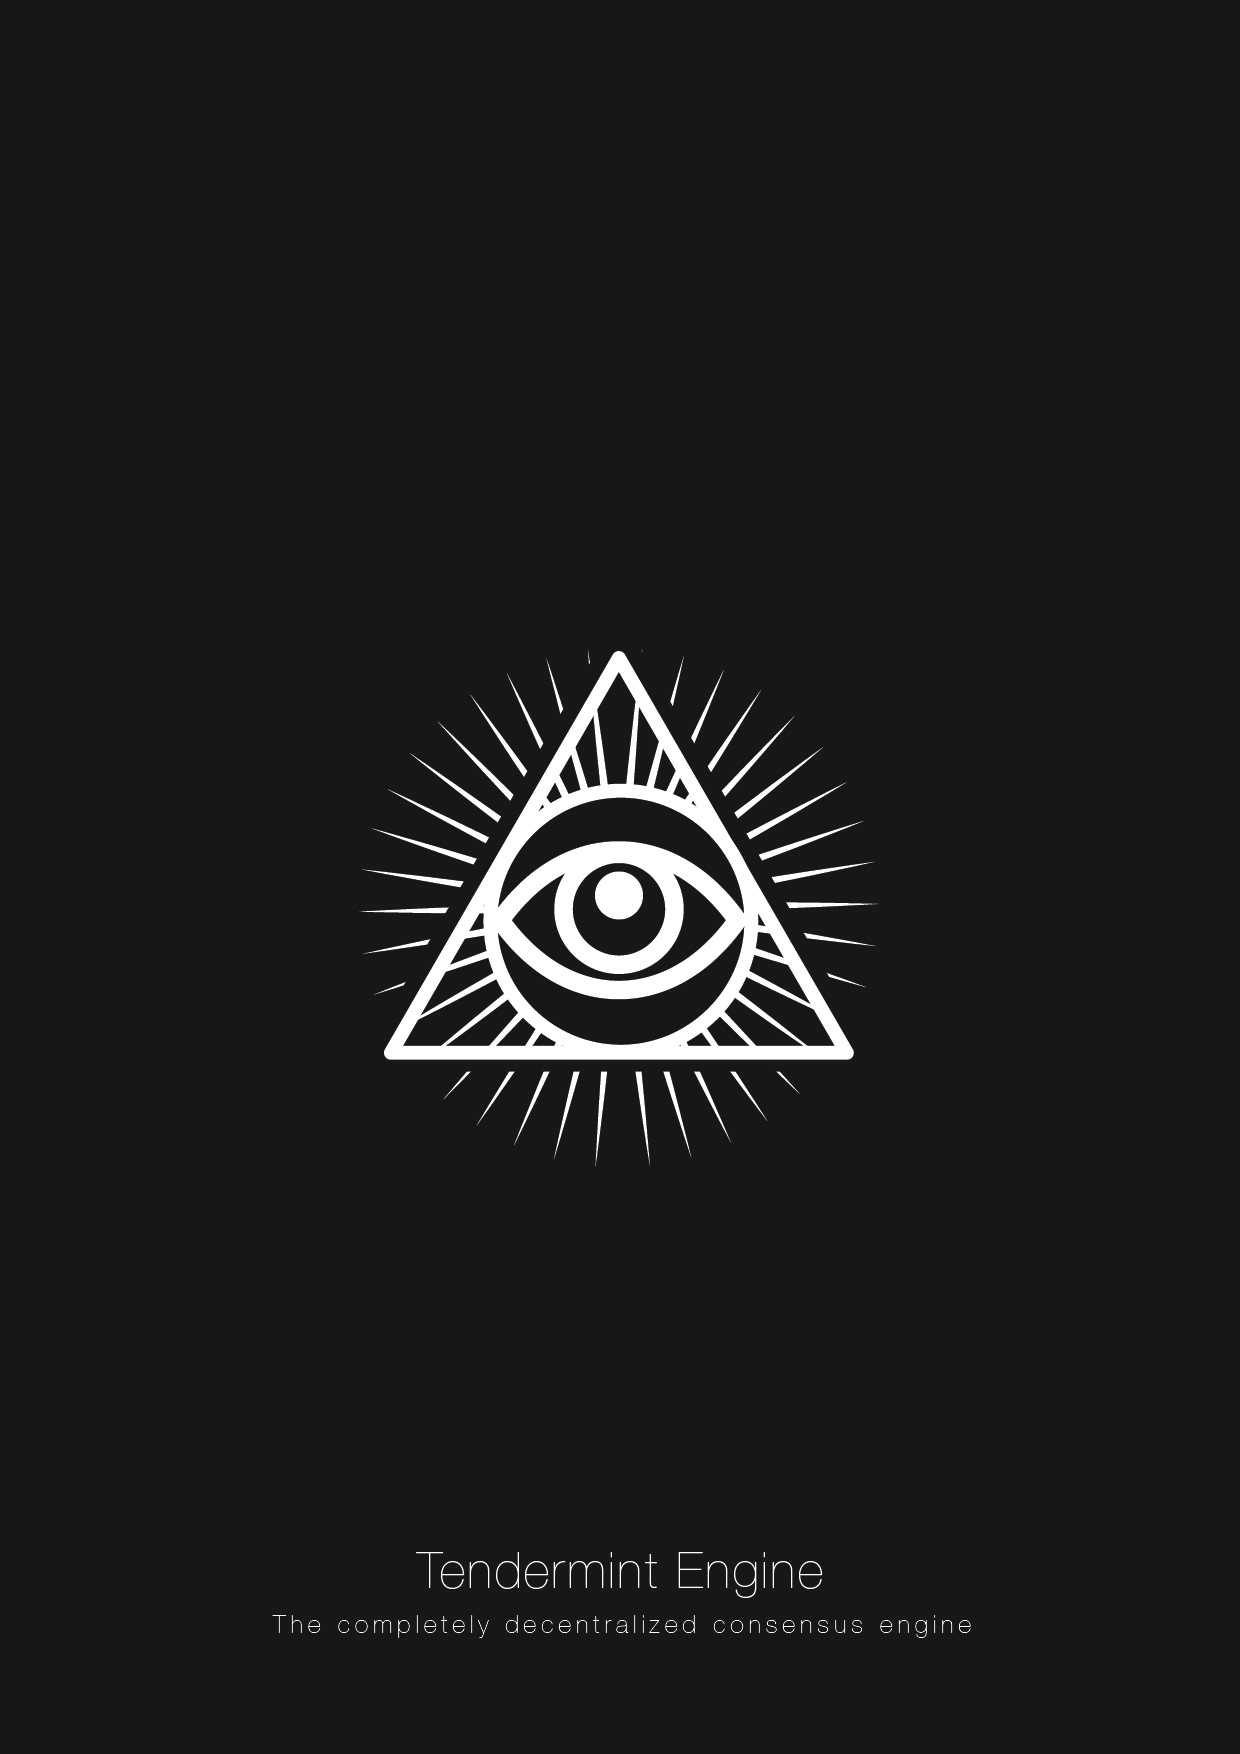 Create an icon for Tendermint, a blockchain technology.